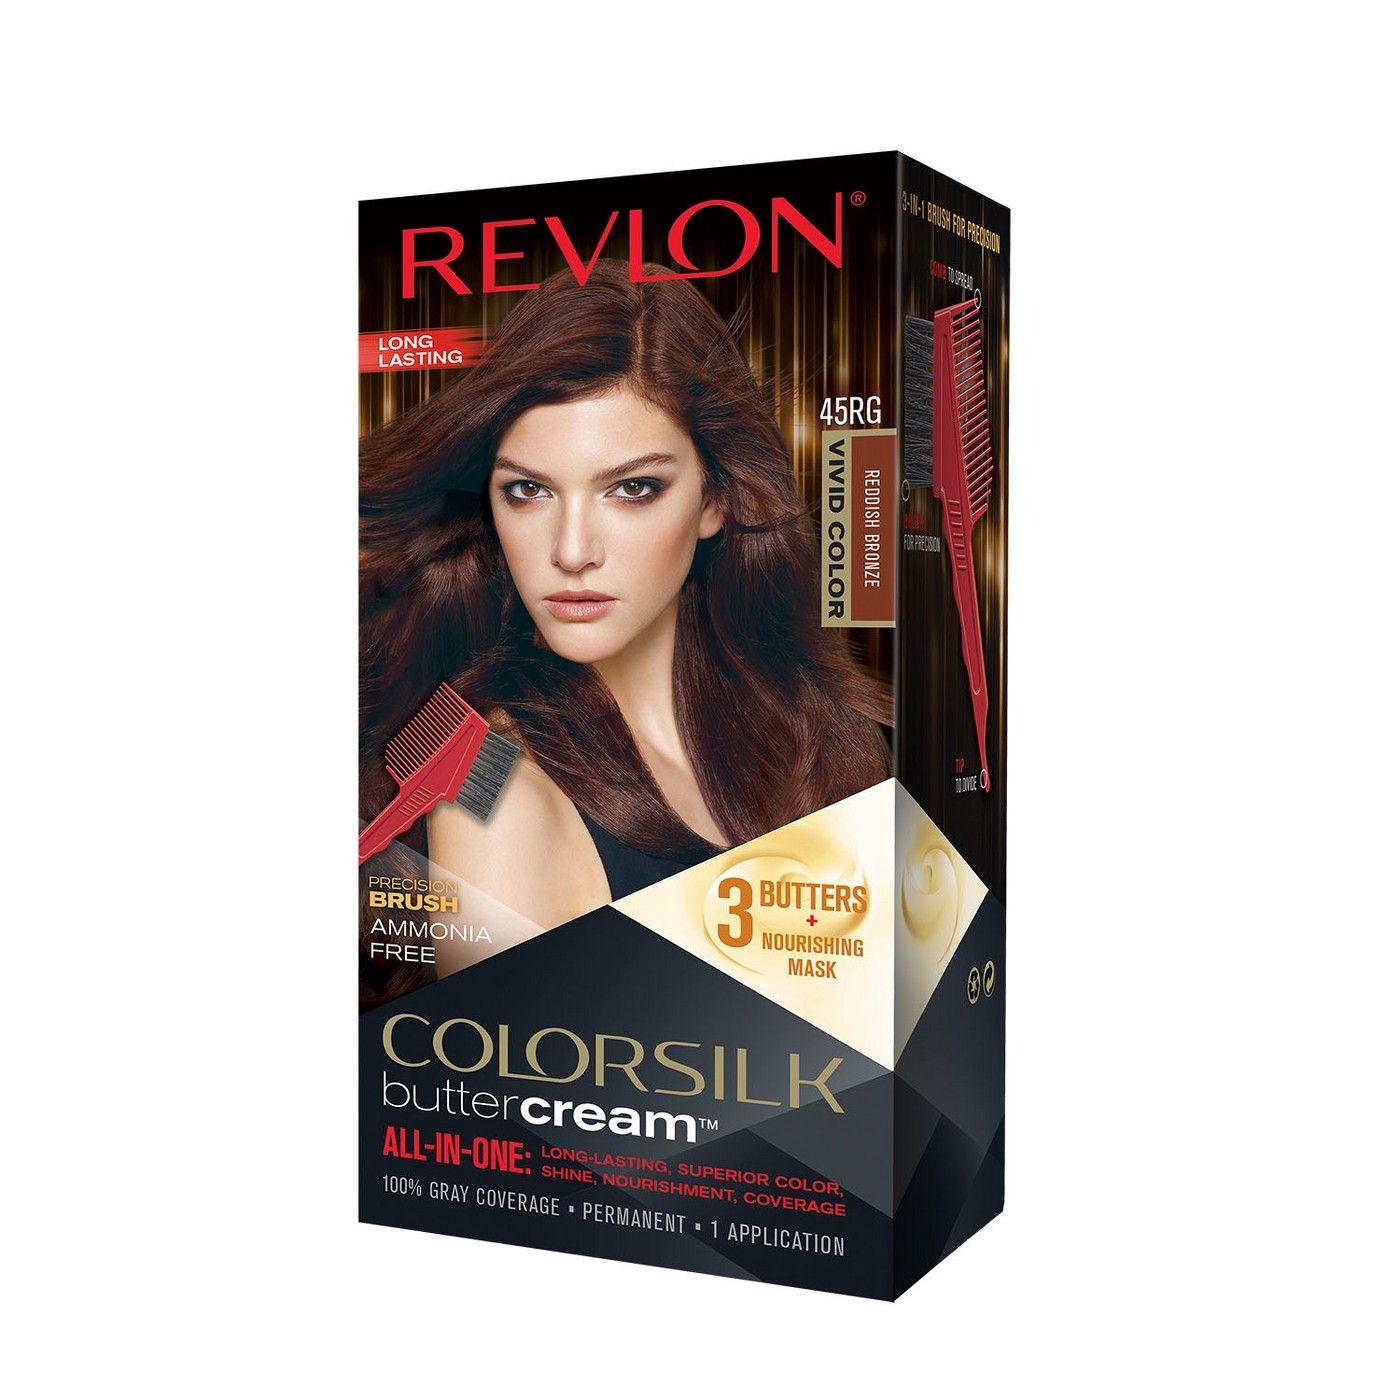 Revlon Luxurious Colorsilk Buttercream Haircolor Image